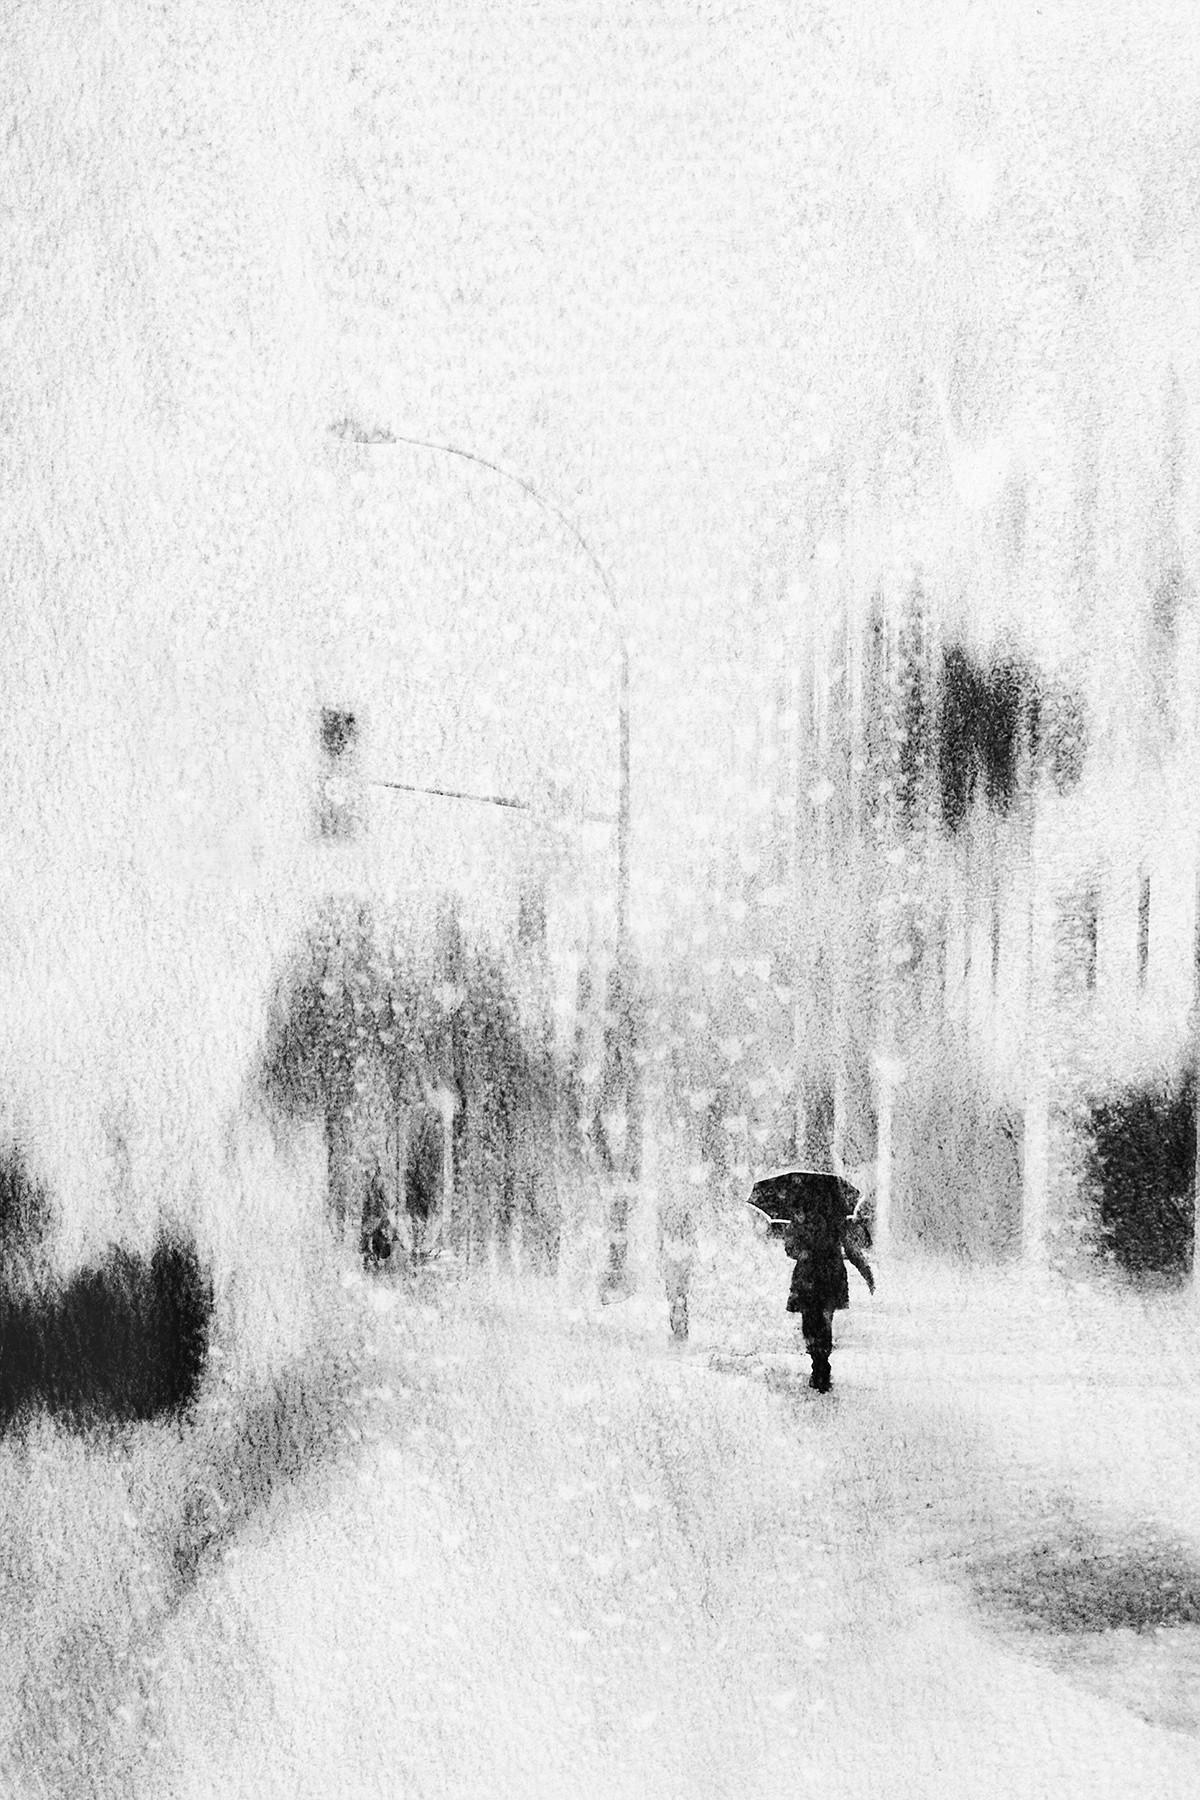 Зима. Автор Даниэль Кастонгуэй